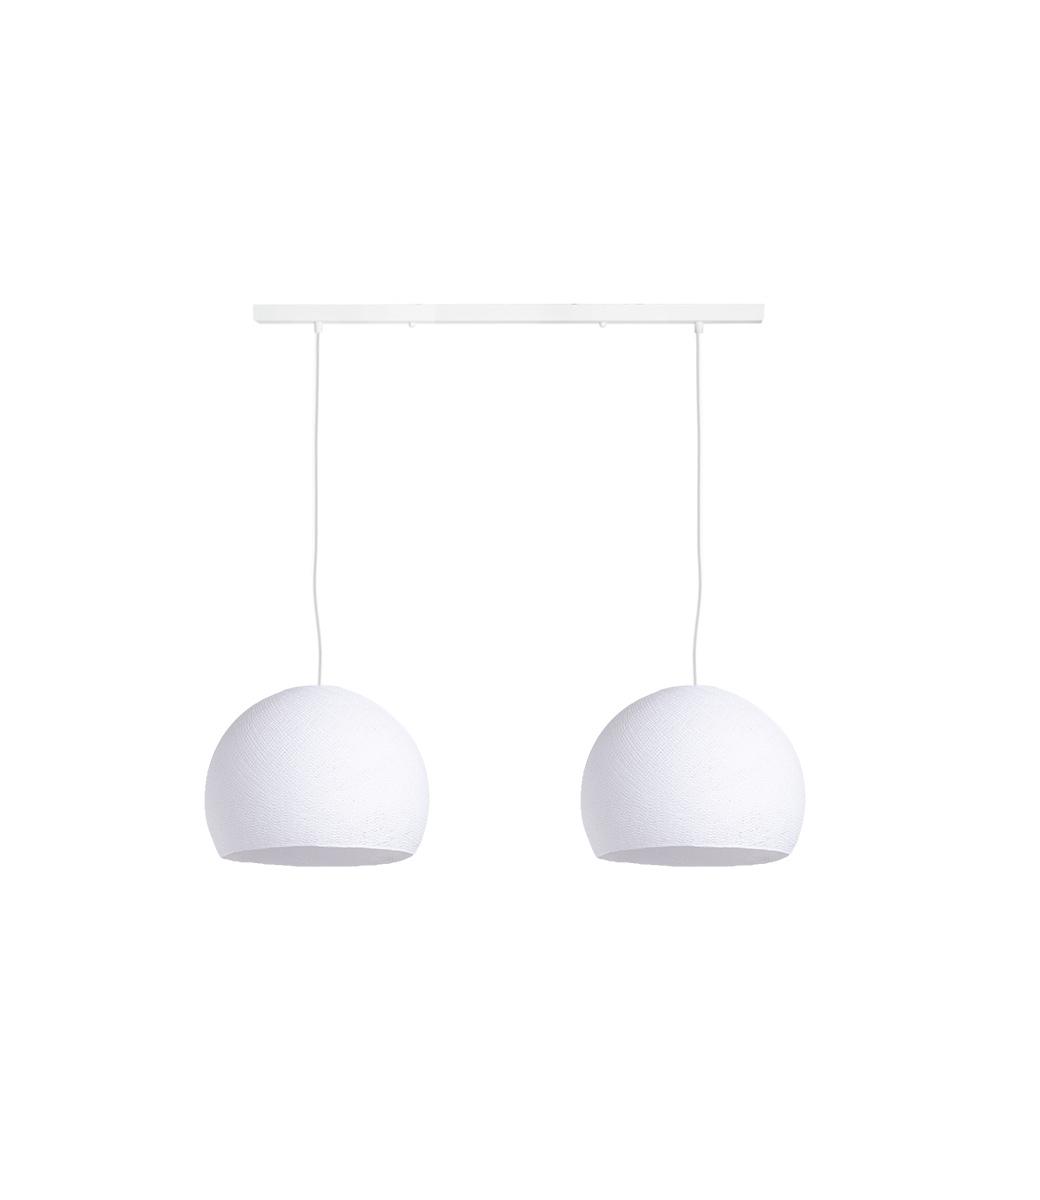 Cotton Ball Lights Tweevoudige hanglamp balk - Driekwart White